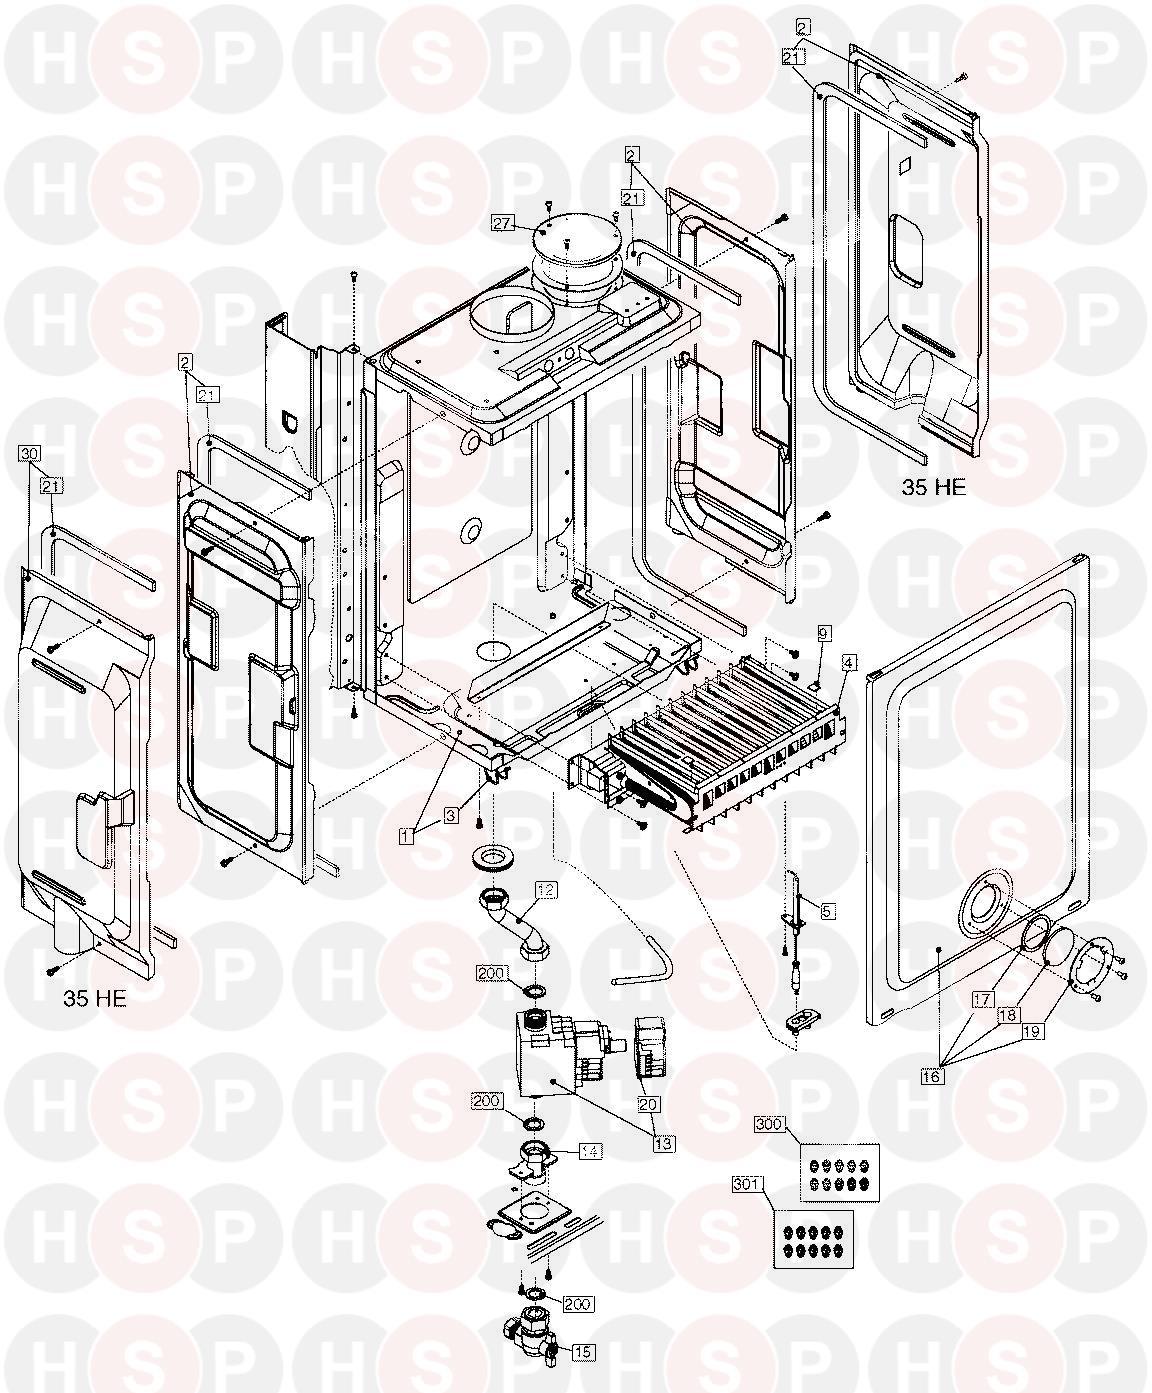 vokera compact 25 he appliance diagram  burner